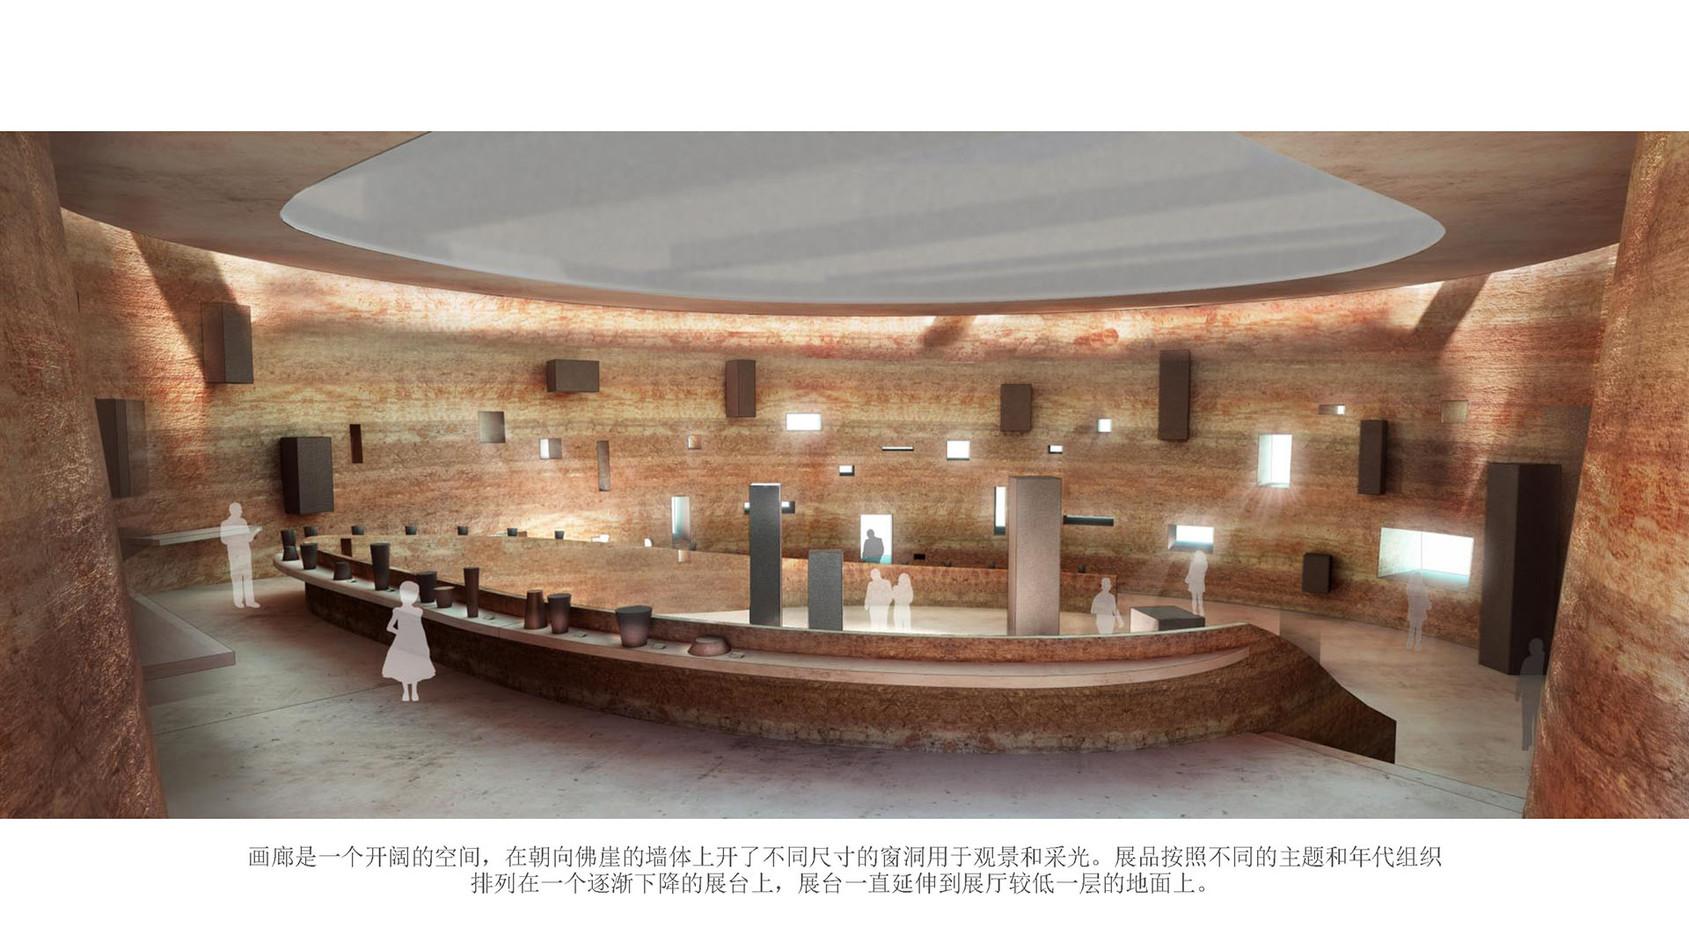 BAMIYAN-CULTURAL-CENTRE-CN_15.jpg